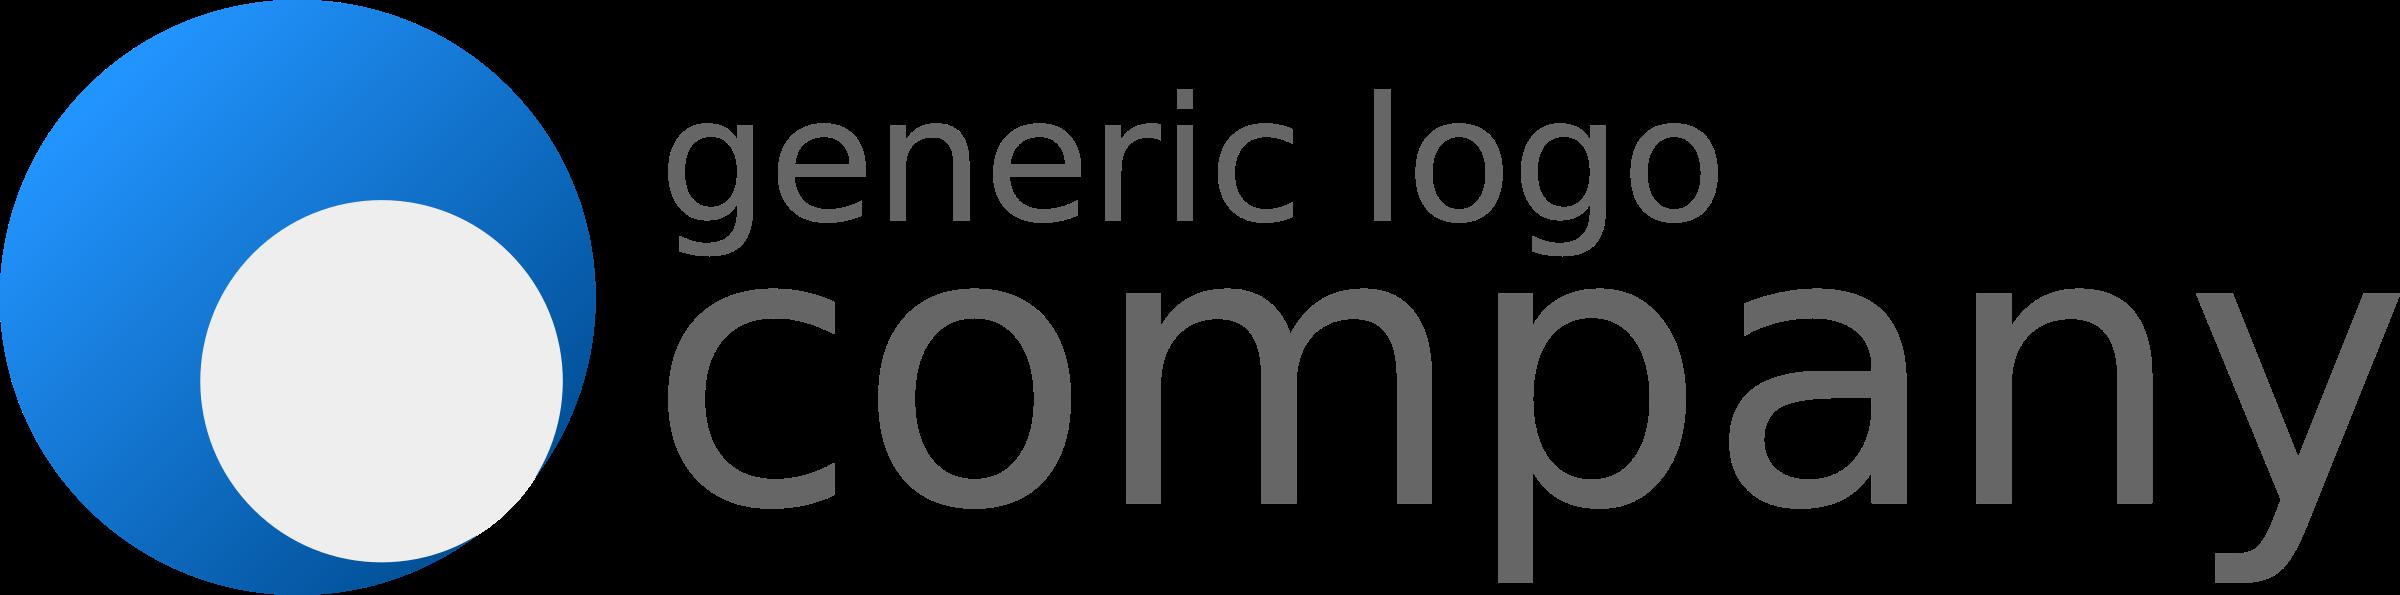 clipart generic logo